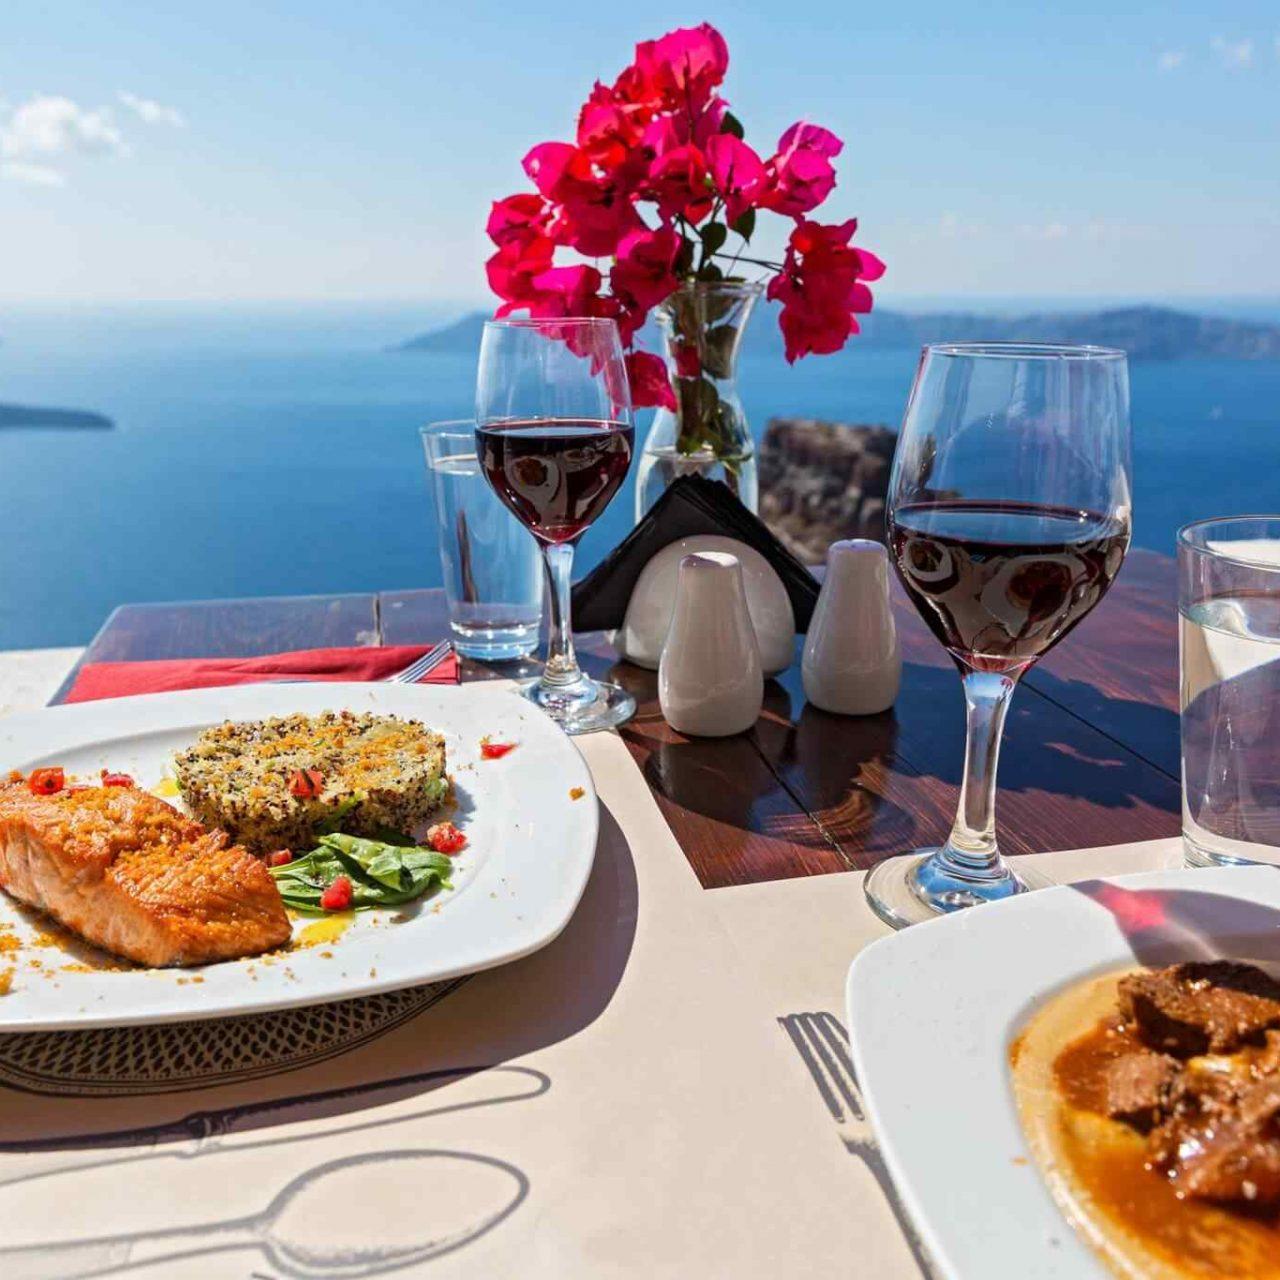 https://menudownloads.com/wp-content/uploads/2017/10/restaurant-italian-25-1280x1280.jpg